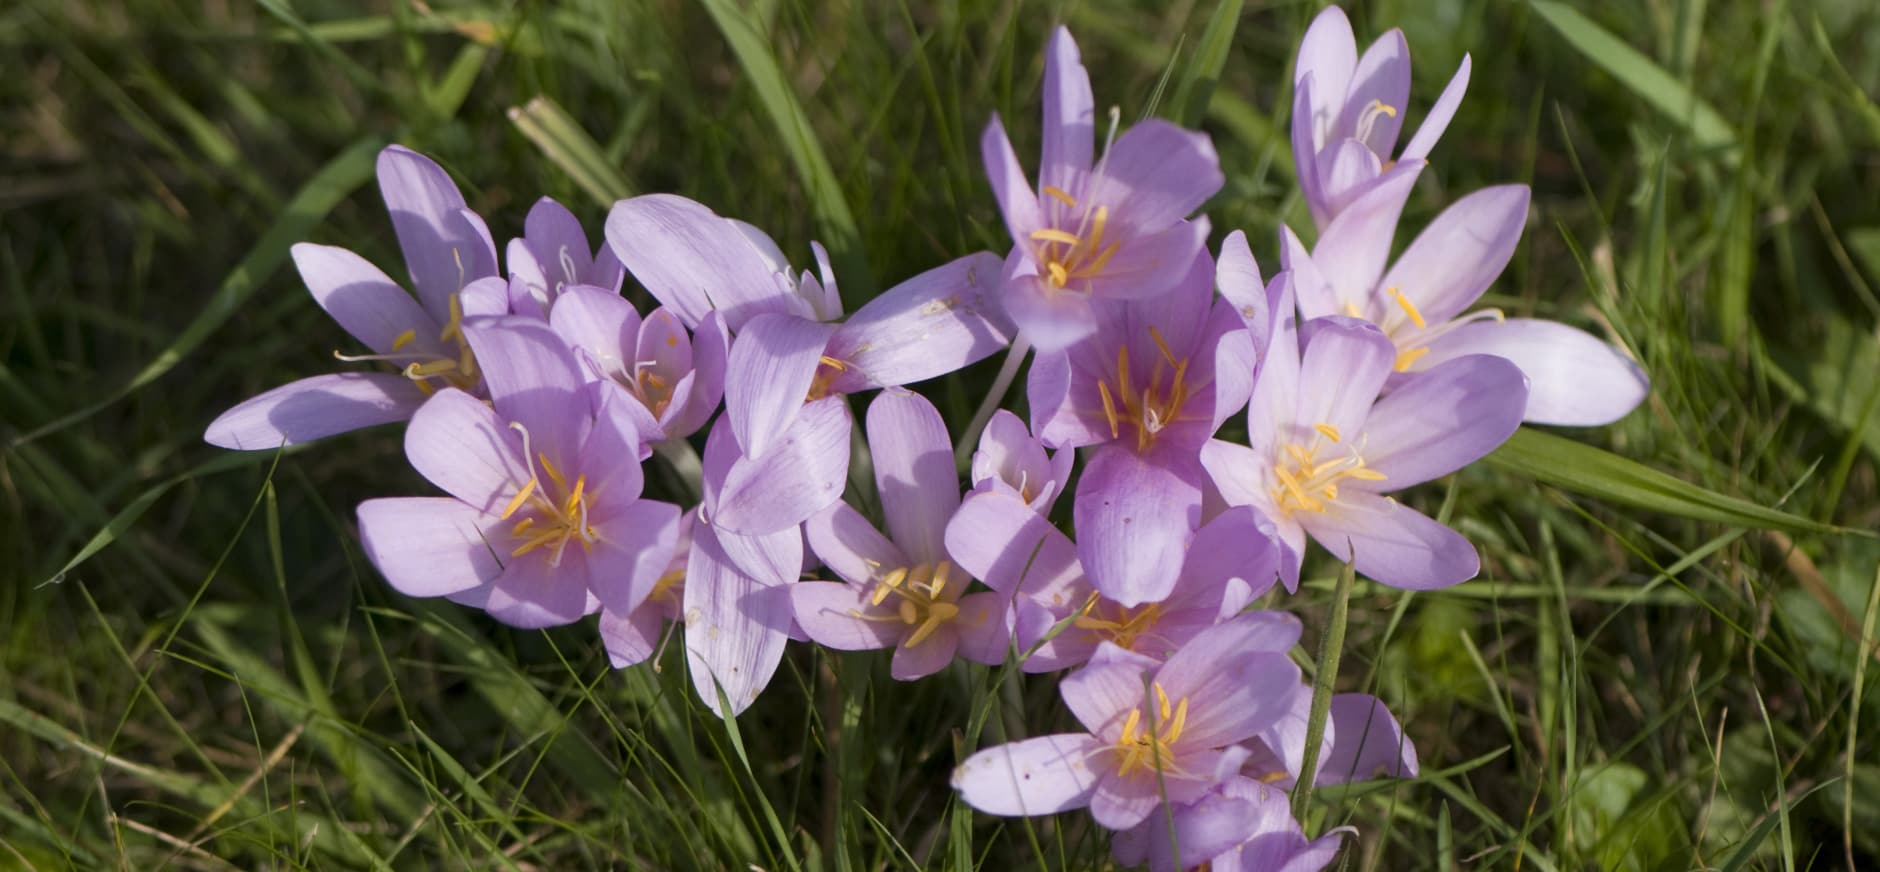 Herfsttijloos bloeit op landgoed Koningshof